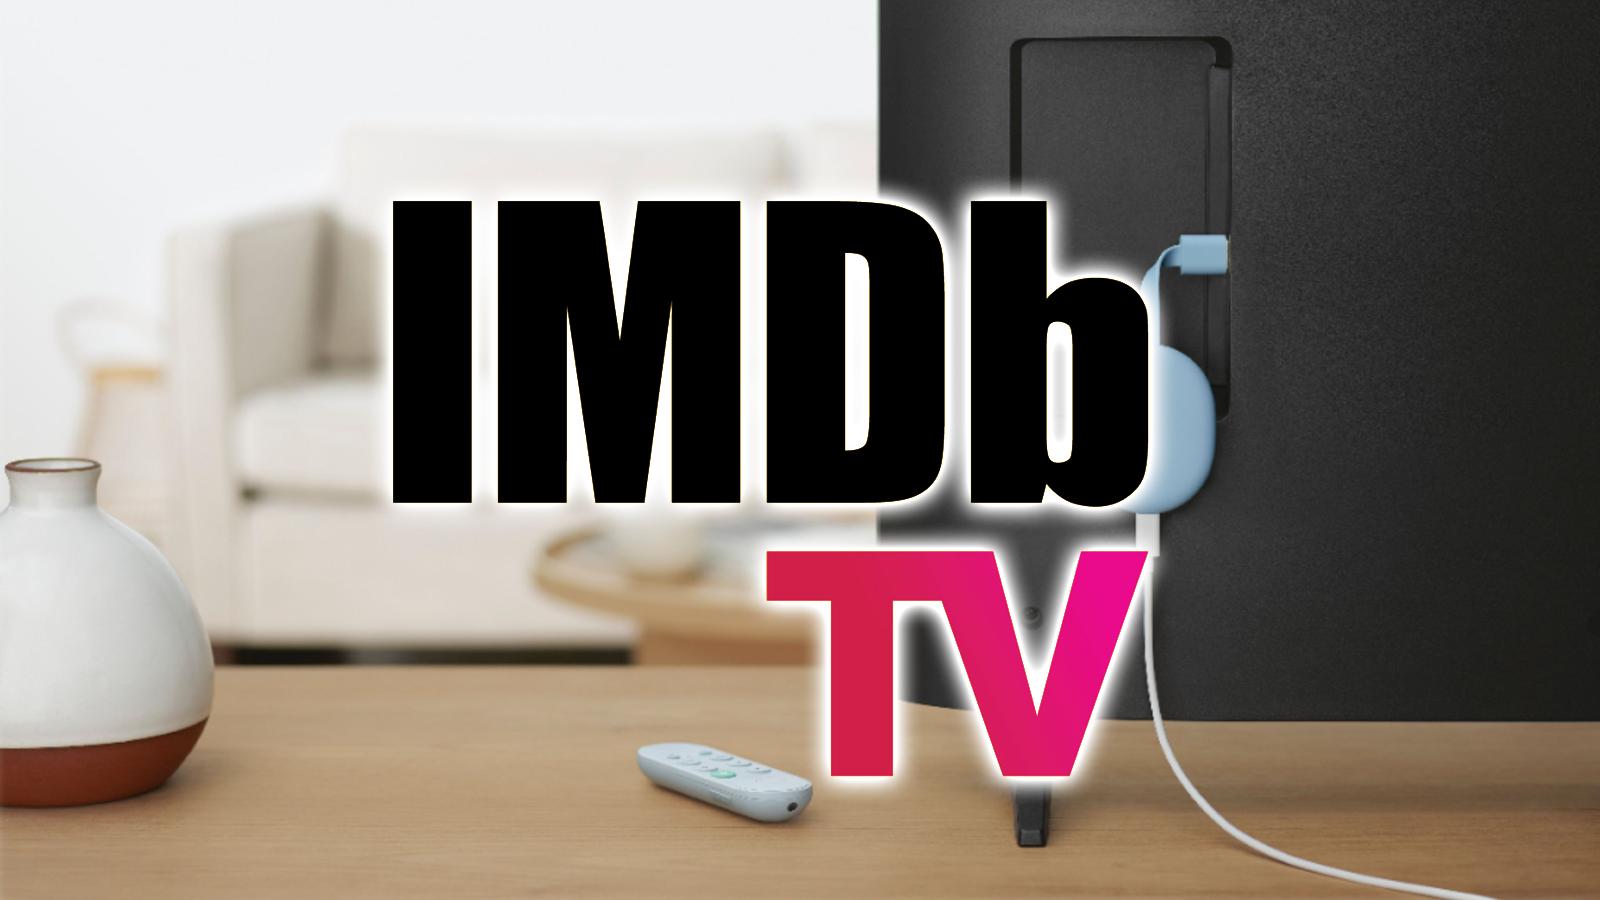 Amazon's Free IMDb Streaming Service Arrives on Chromecast with Google TV thumbnail